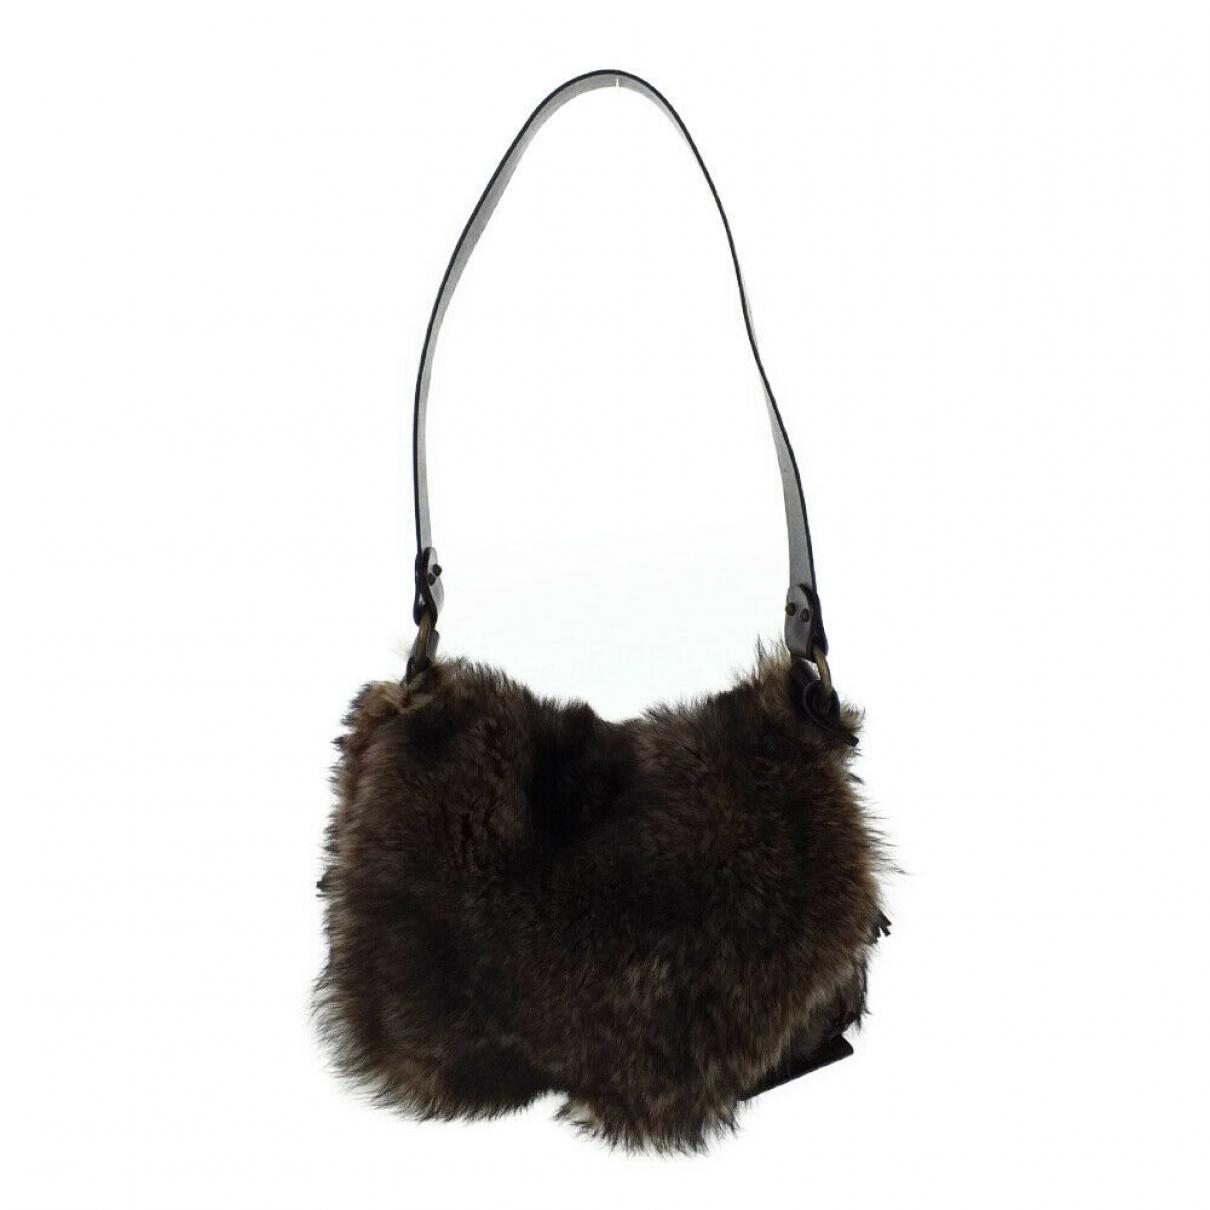 Dolce & Gabbana \N Brown Suede handbag for Women \N